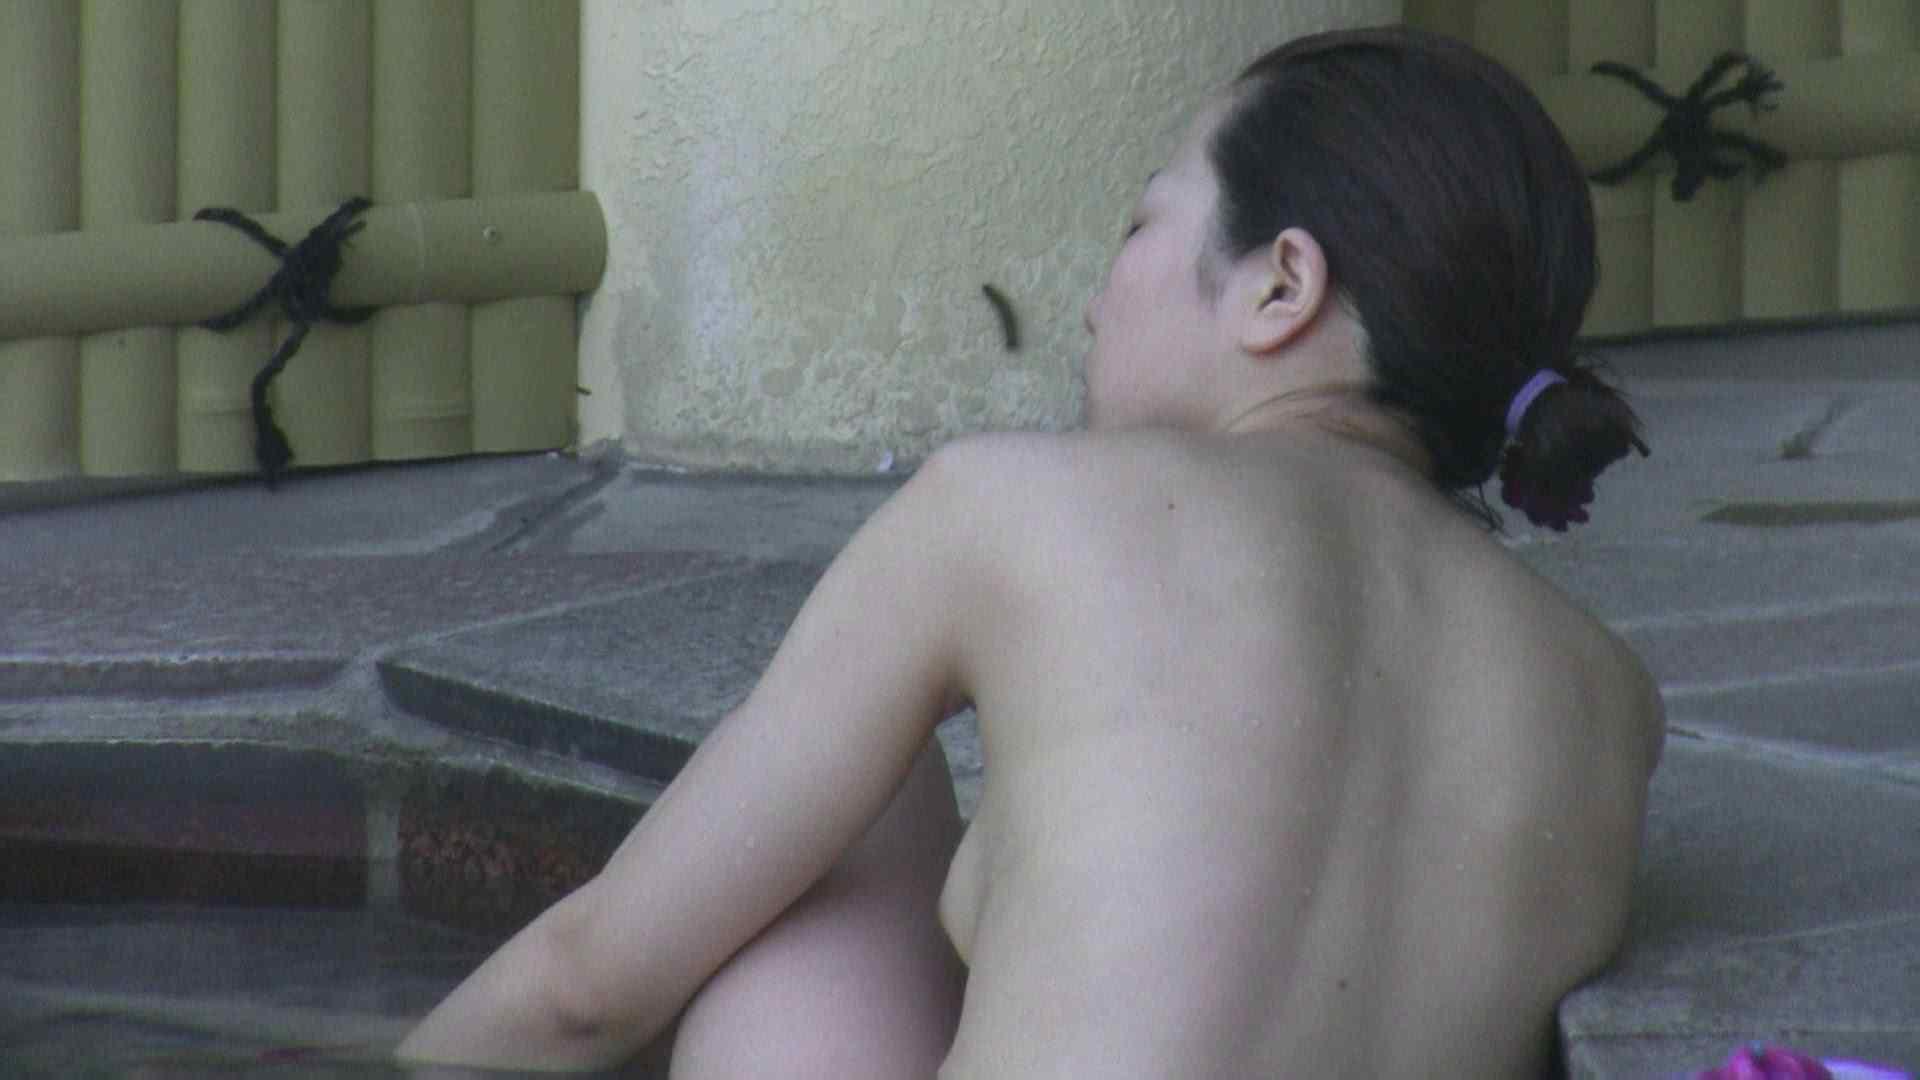 Aquaな露天風呂Vol.88【VIP限定】 OLのエロ生活 | 露天風呂  61連発 52